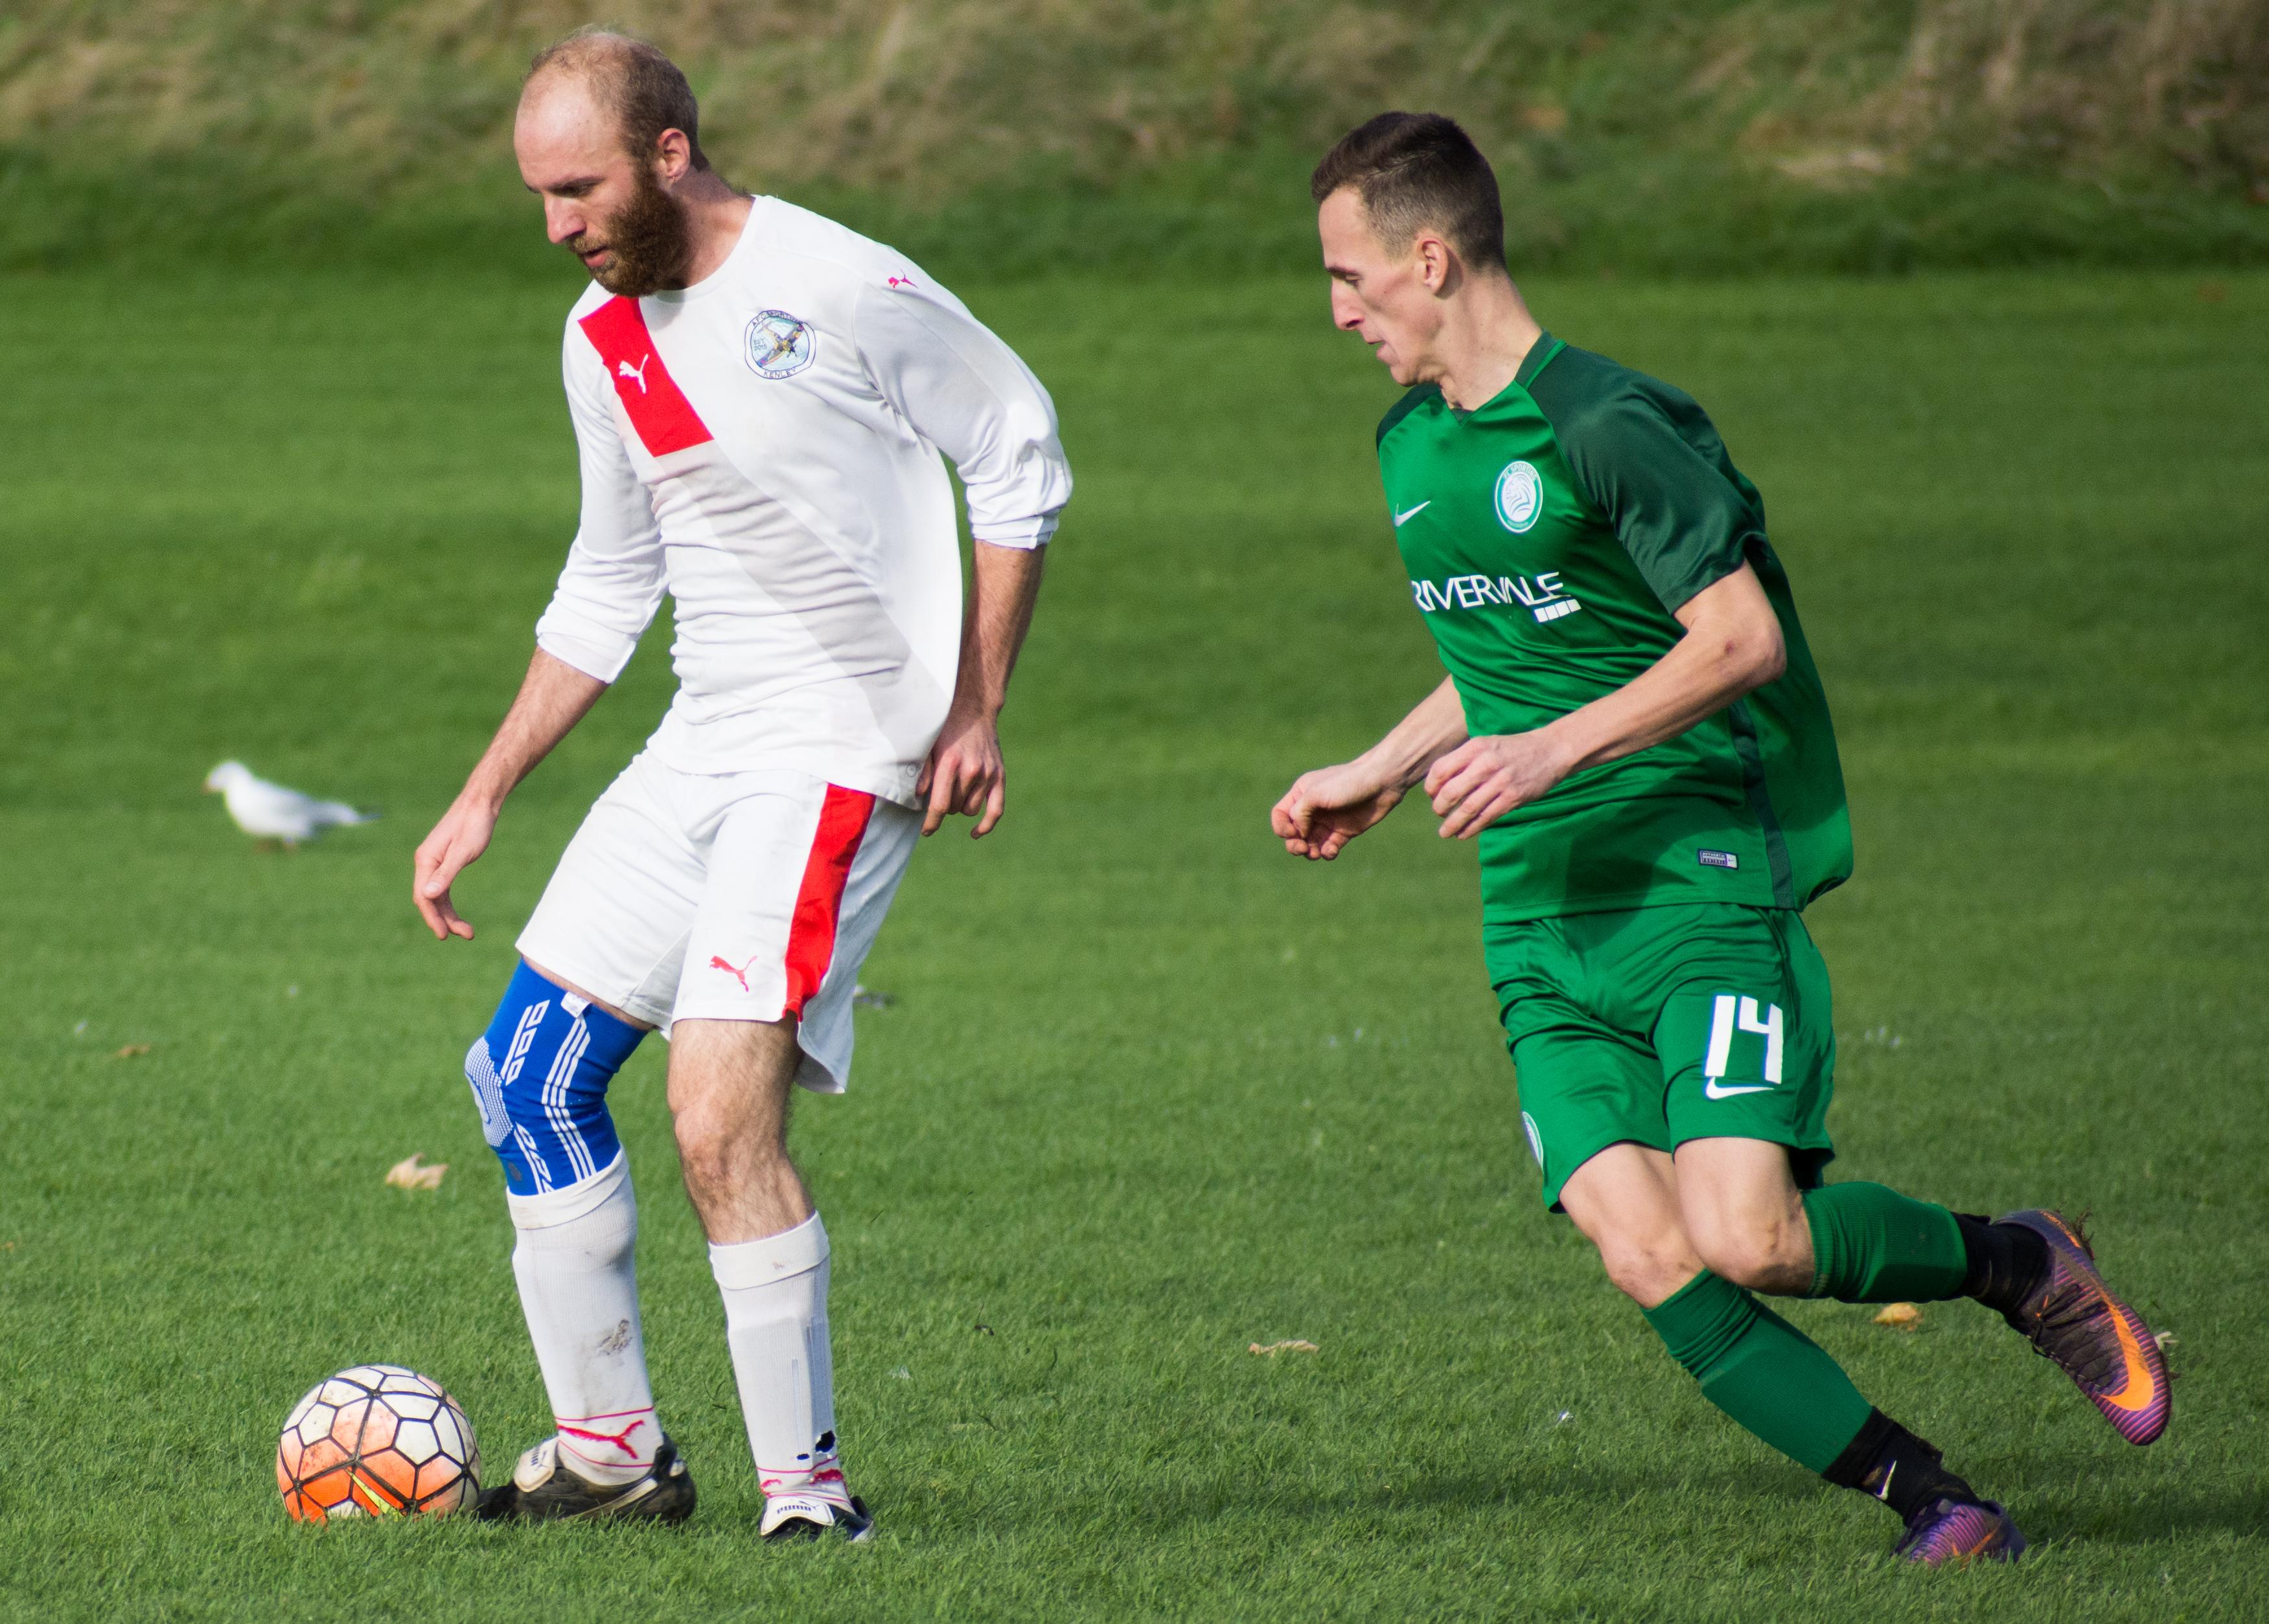 FC Sporting vs Brighton Lights 21.10.17 18